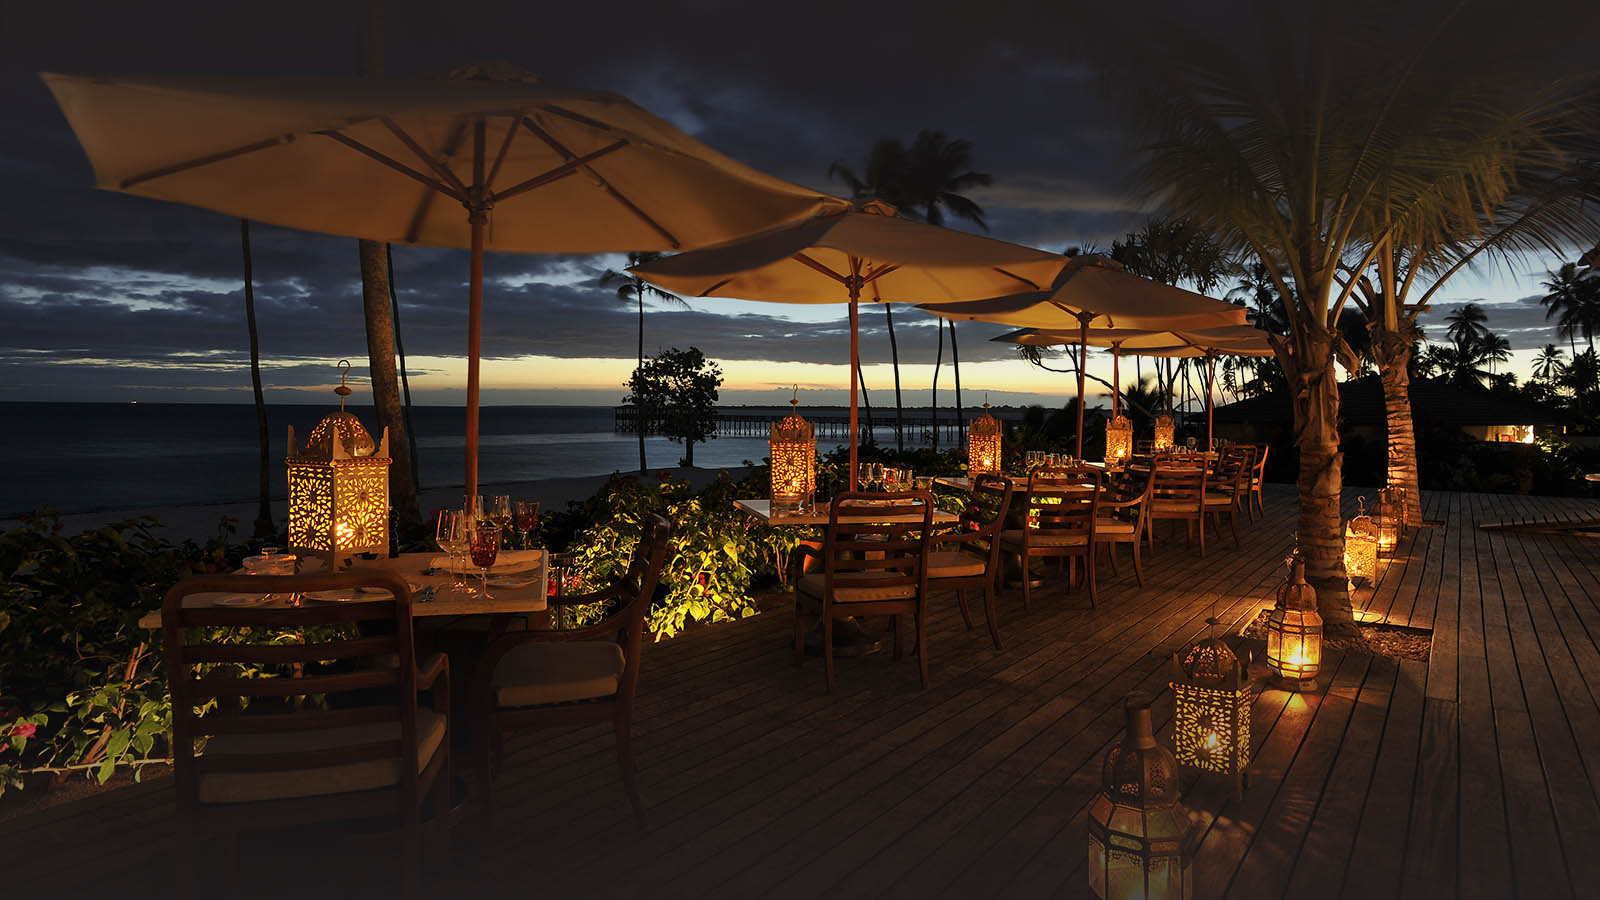 the residence south-of-zanzibar–kizimkazi-lodges-zambia-in-style-tanzania-stunningly-picturesque-island-evening-dining